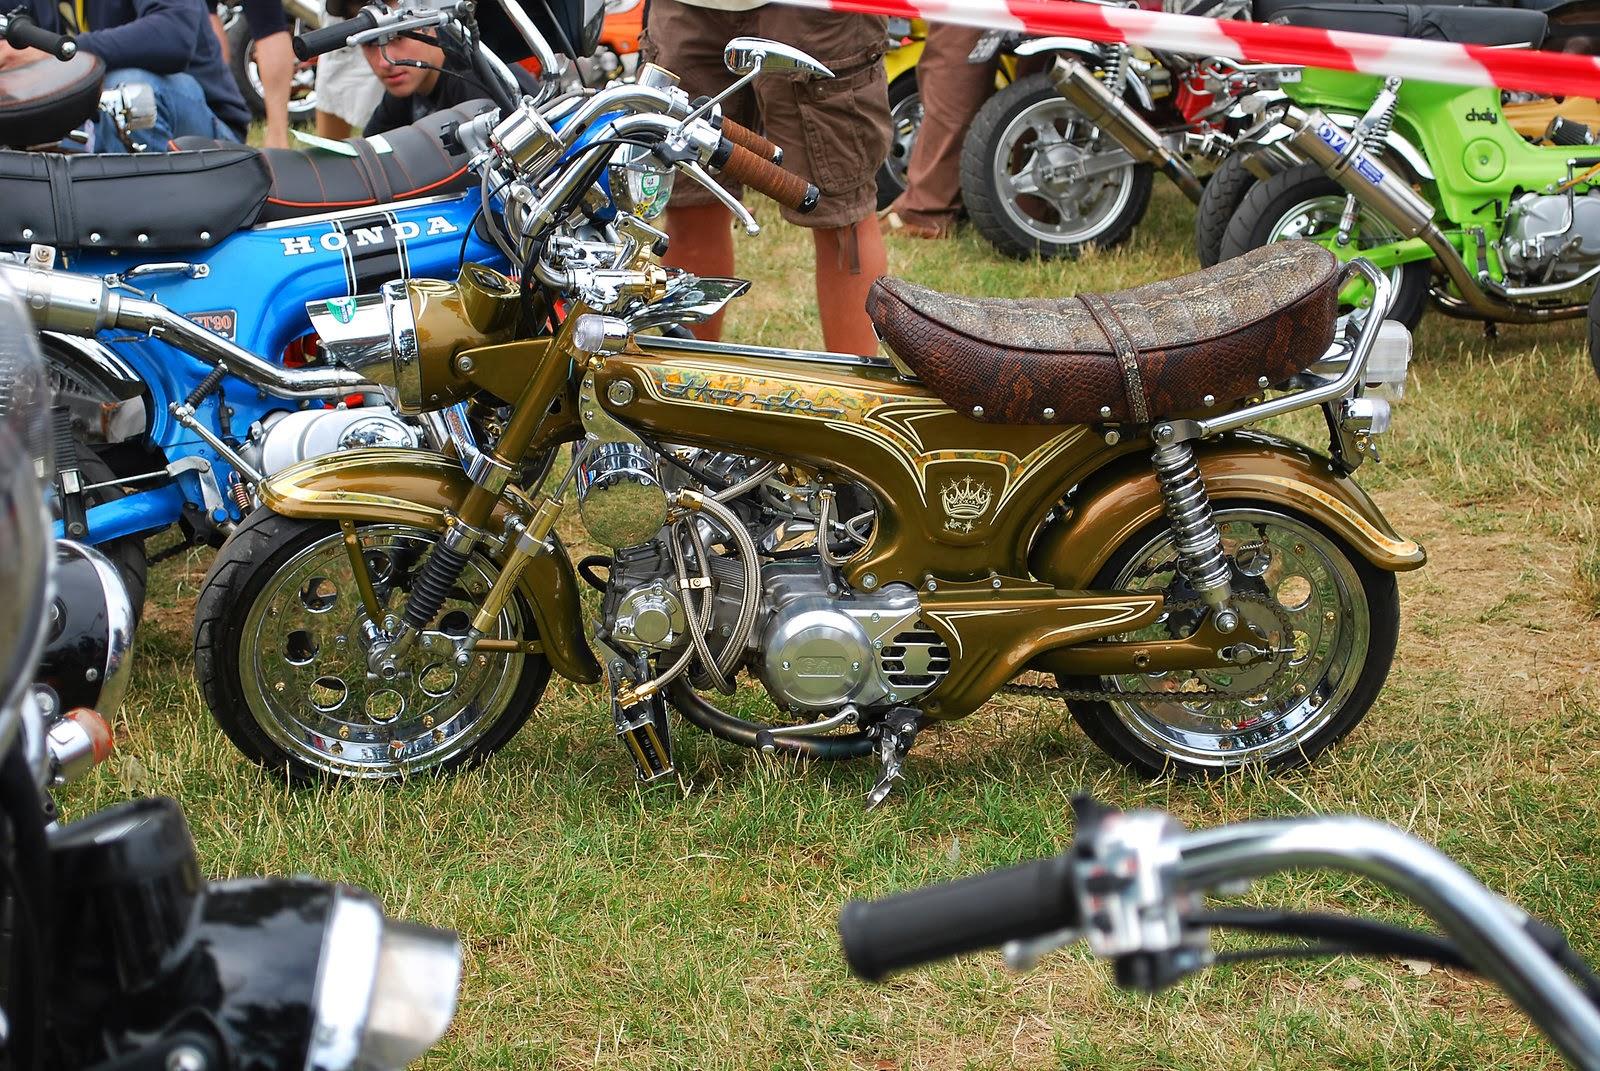 historia motos personalizadas moto tuning 110. Black Bedroom Furniture Sets. Home Design Ideas